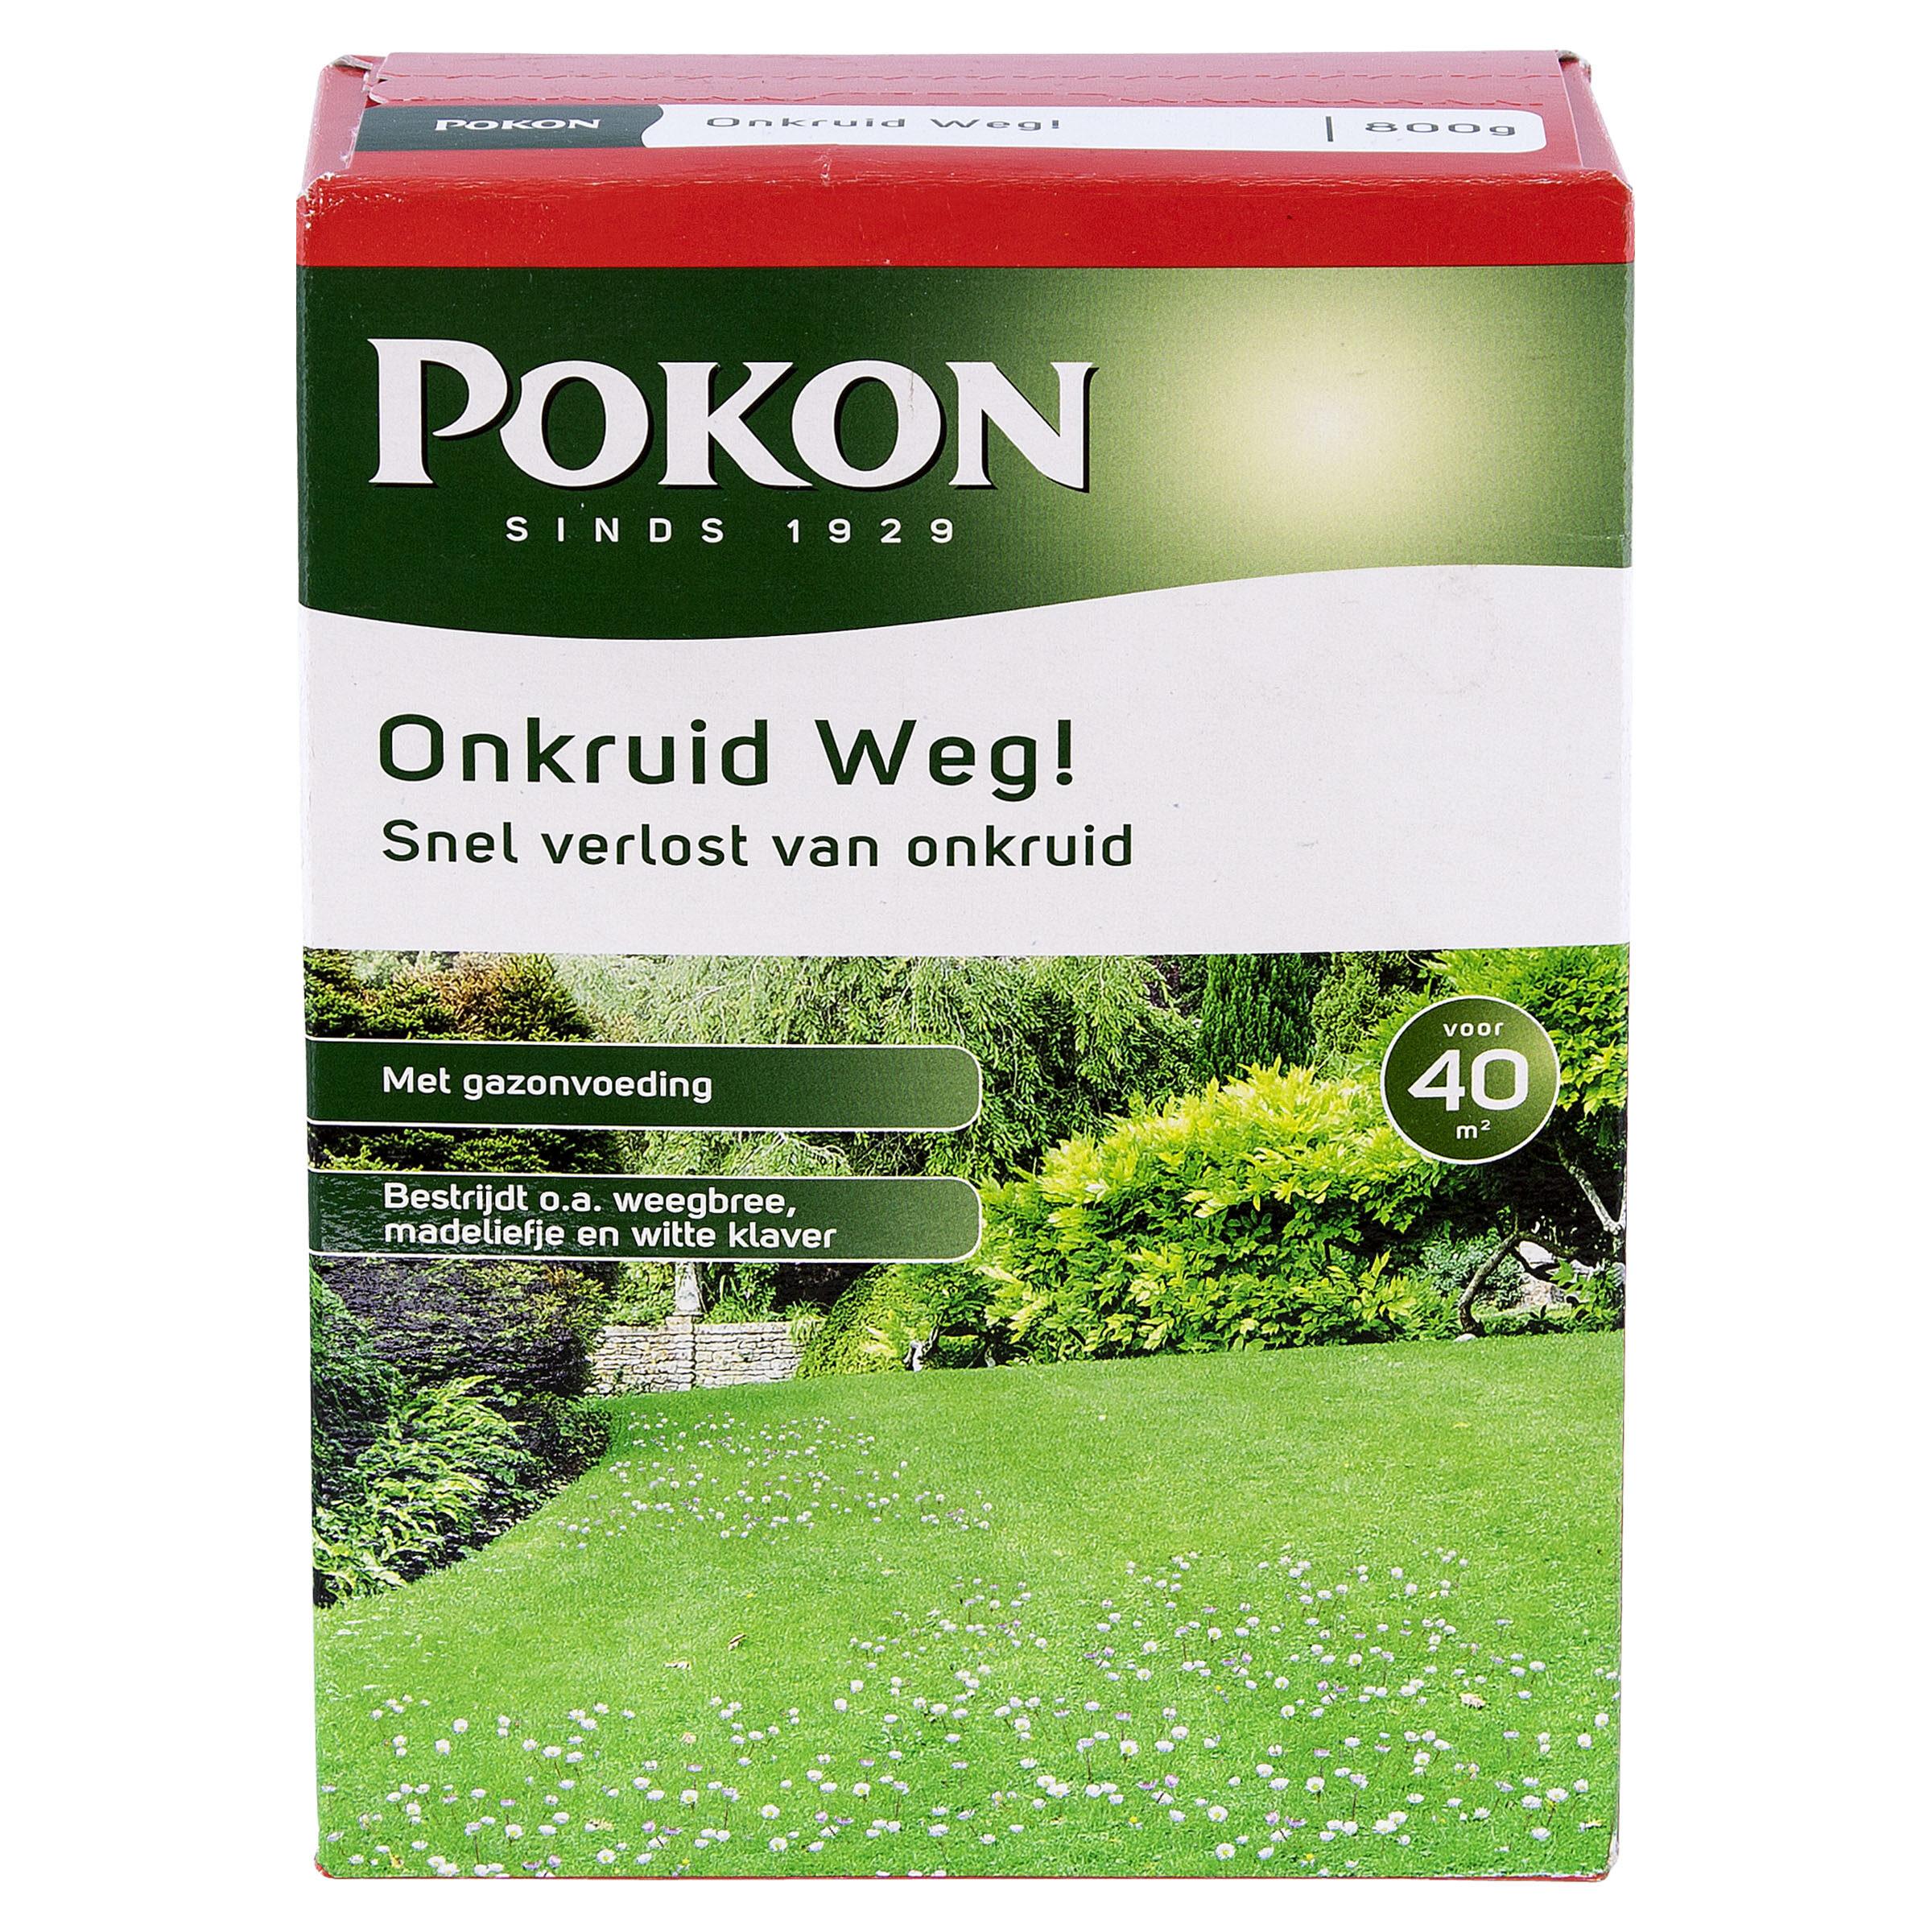 Pokon Onkruid Weg! 800gr - cover